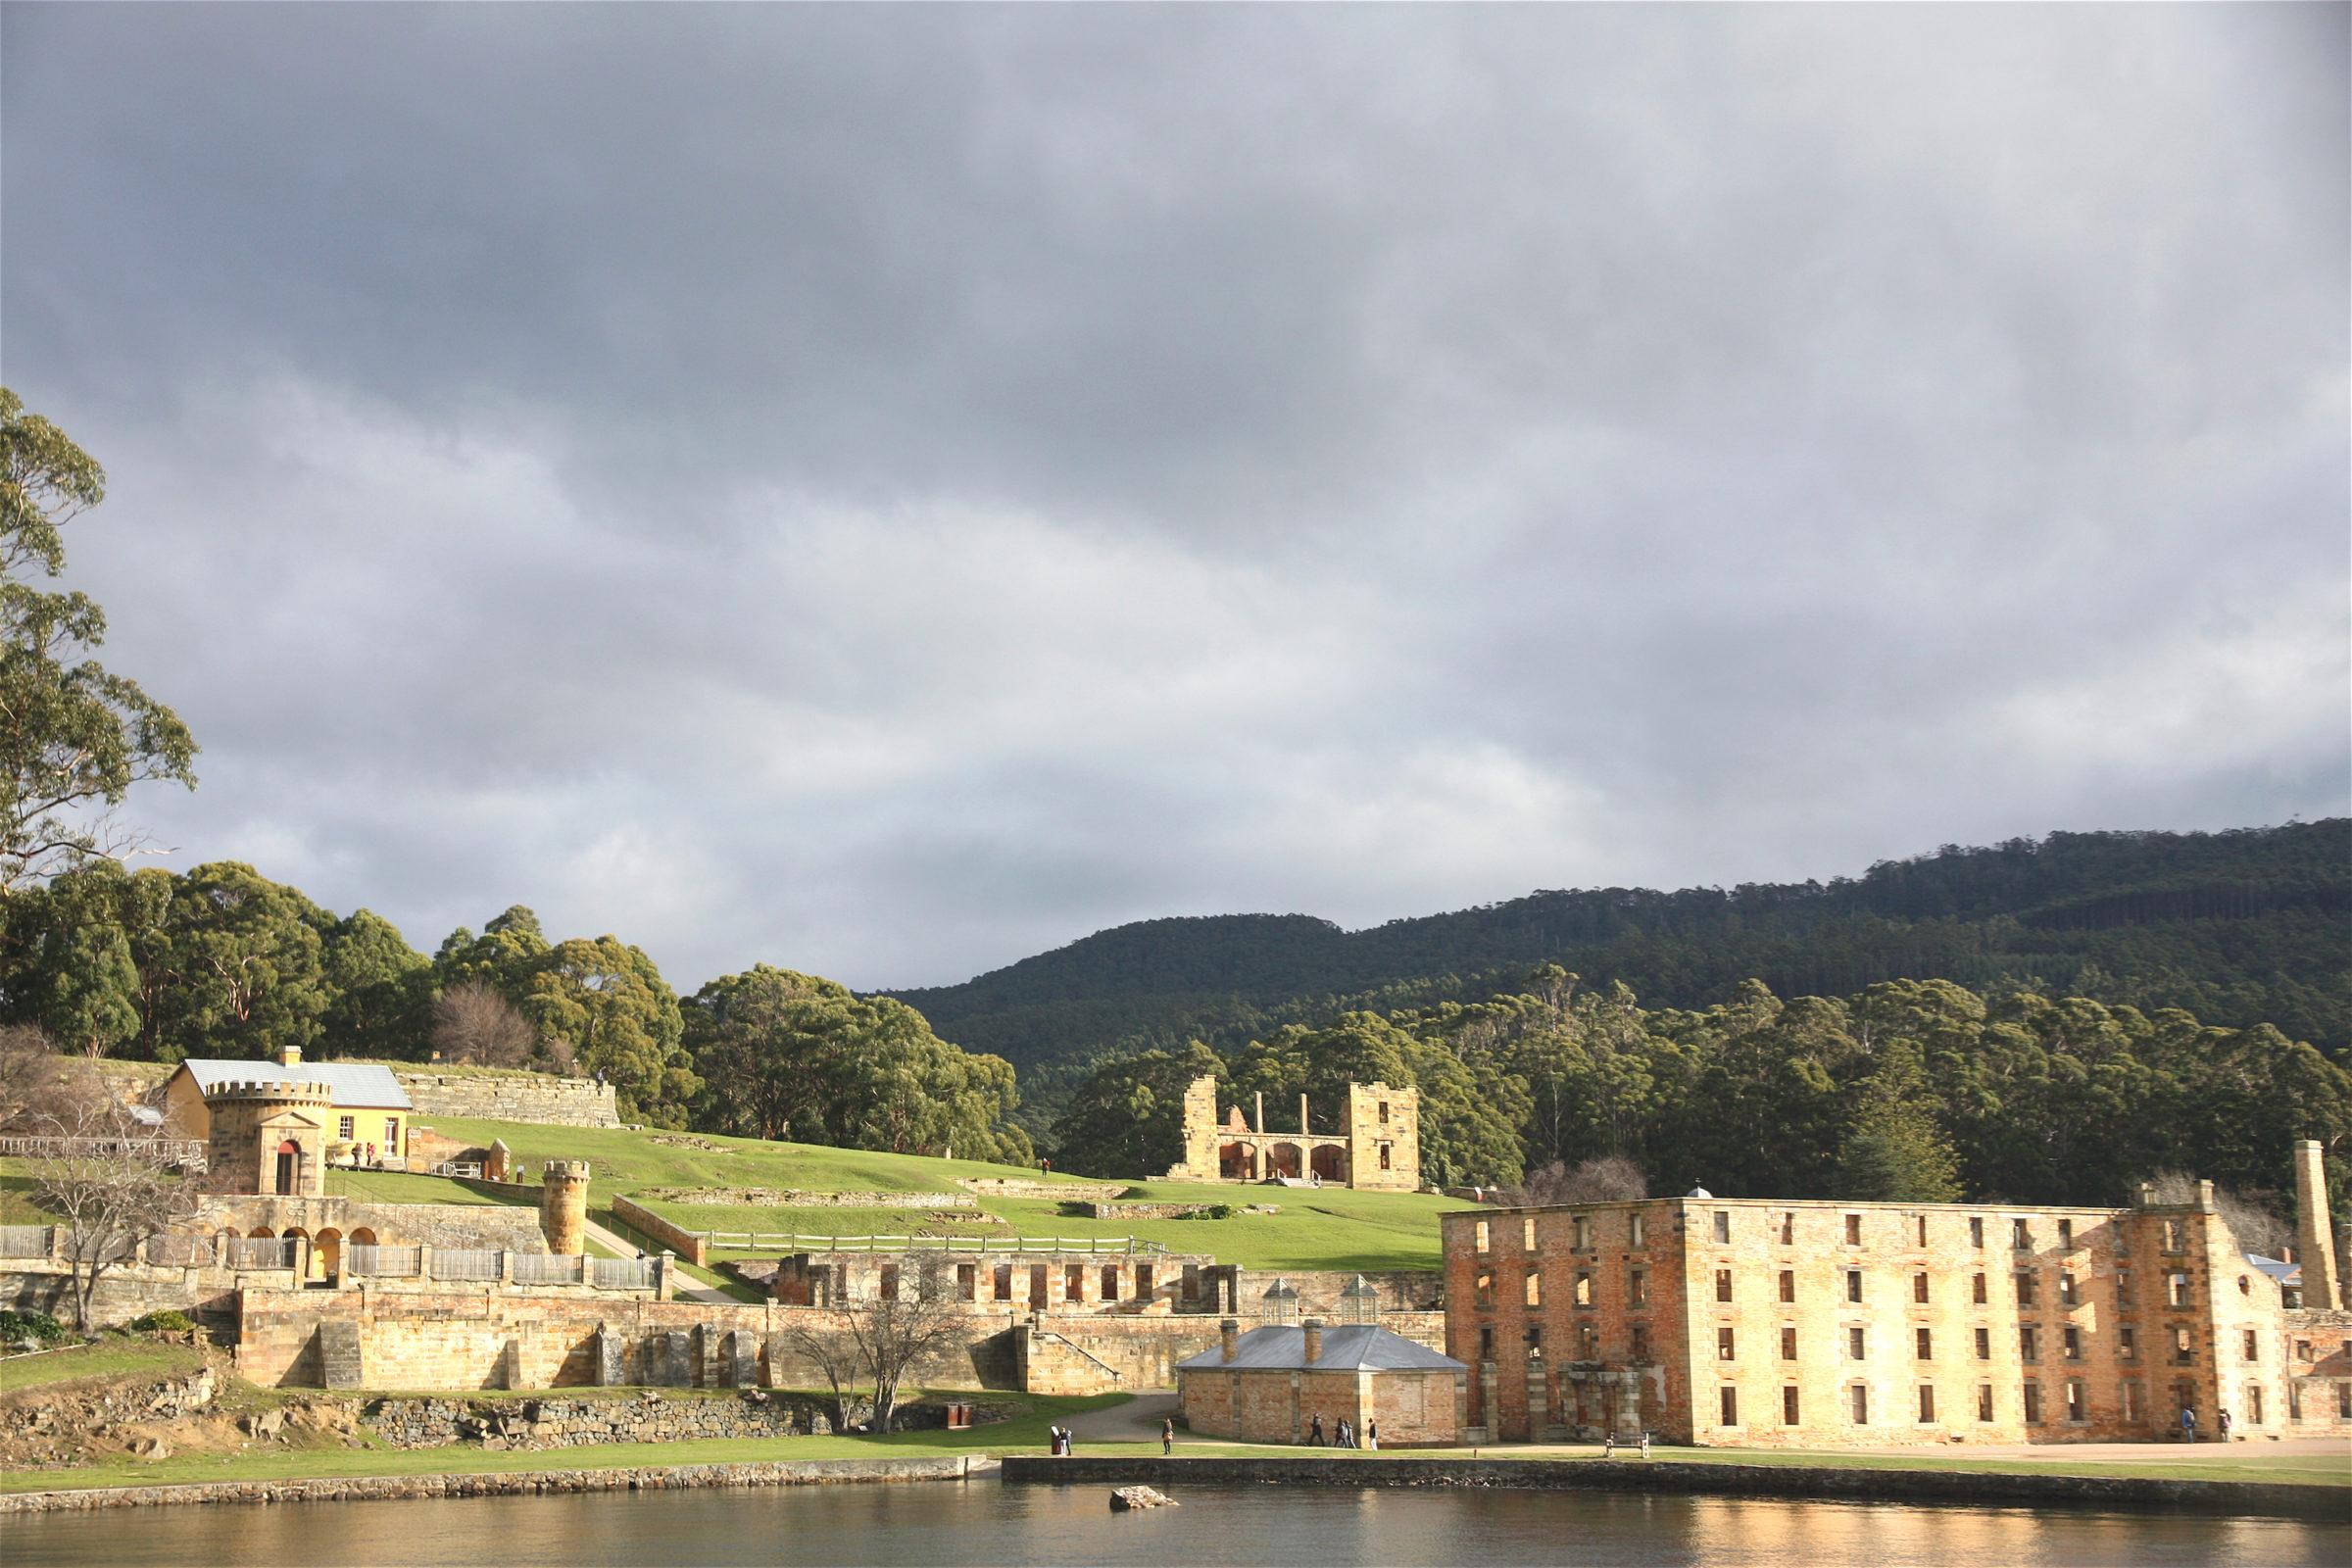 Tasmania Road Trip Itinerary, Day 3: Port Arthur